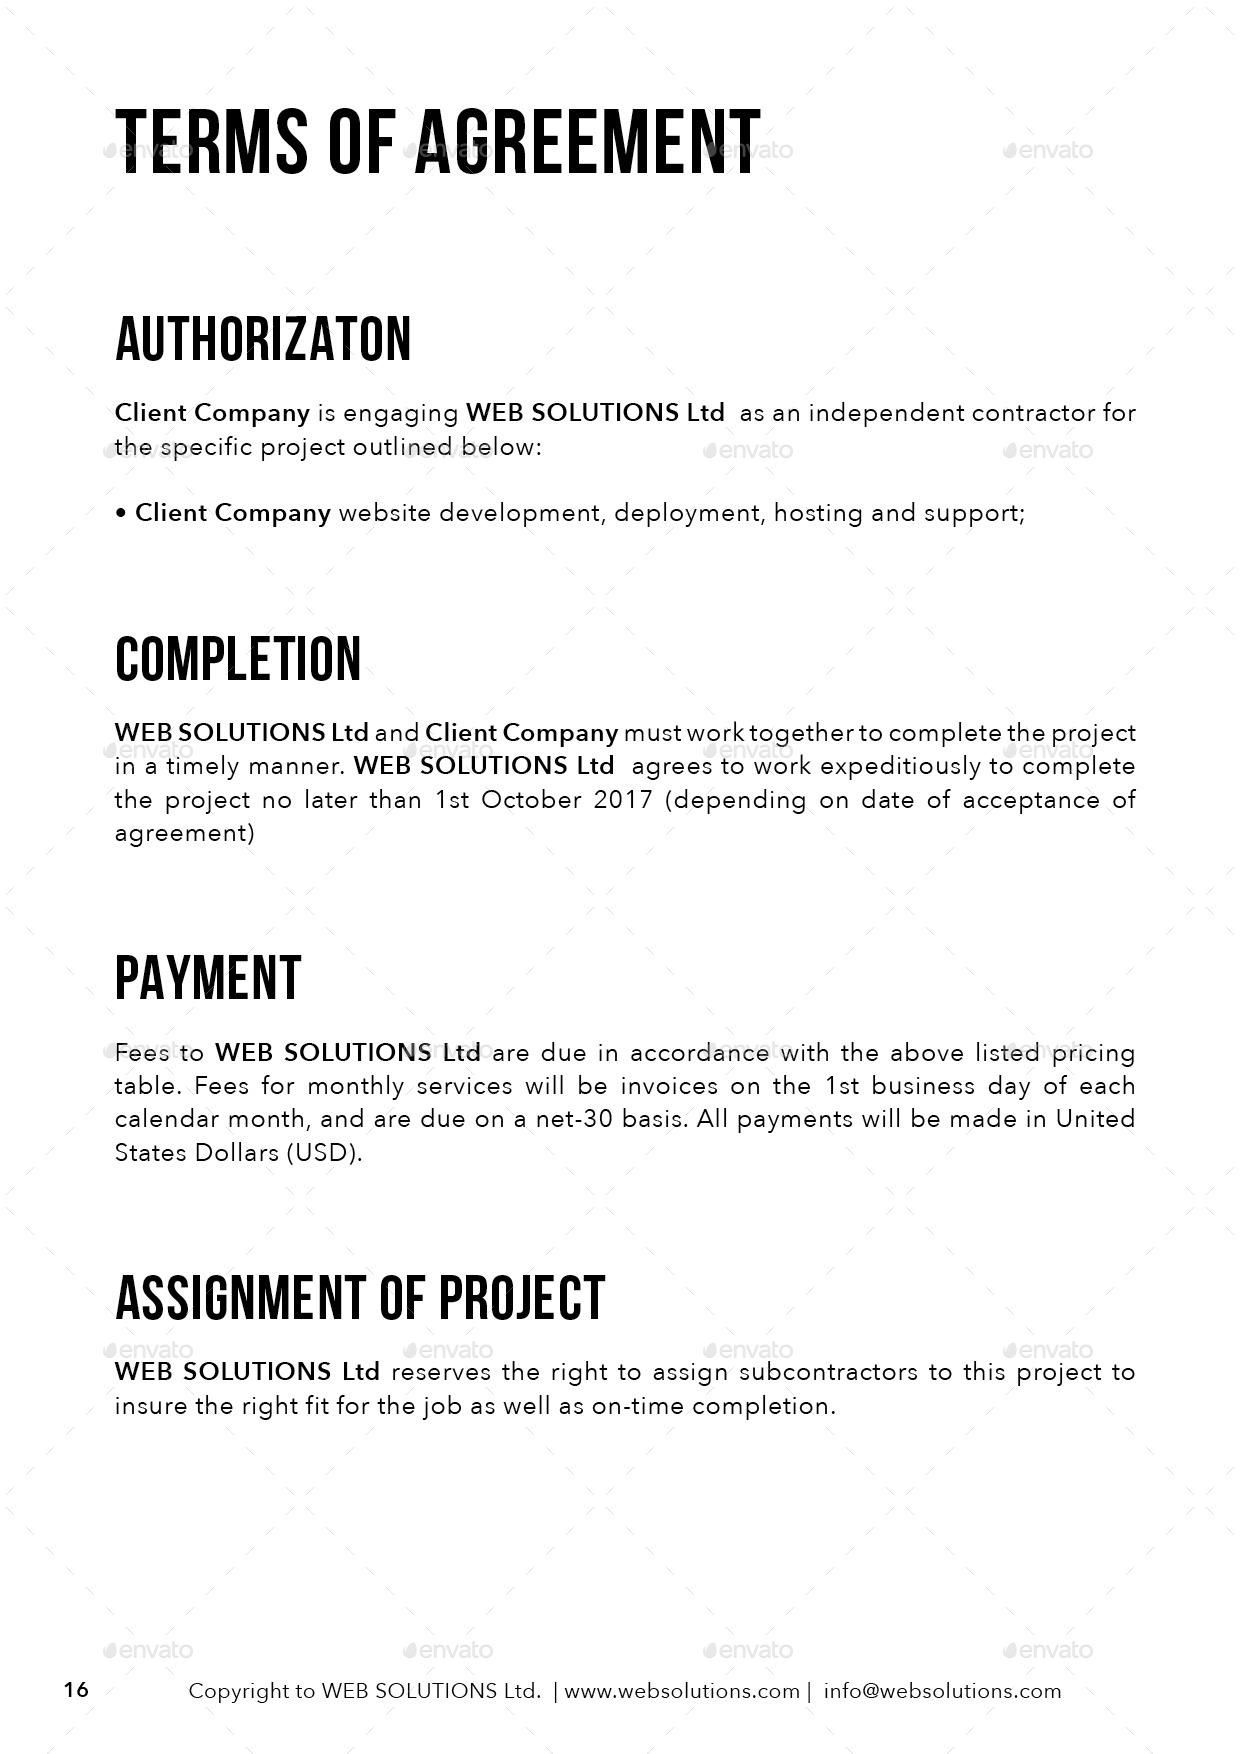 Adelante Development Center  A Community Resource